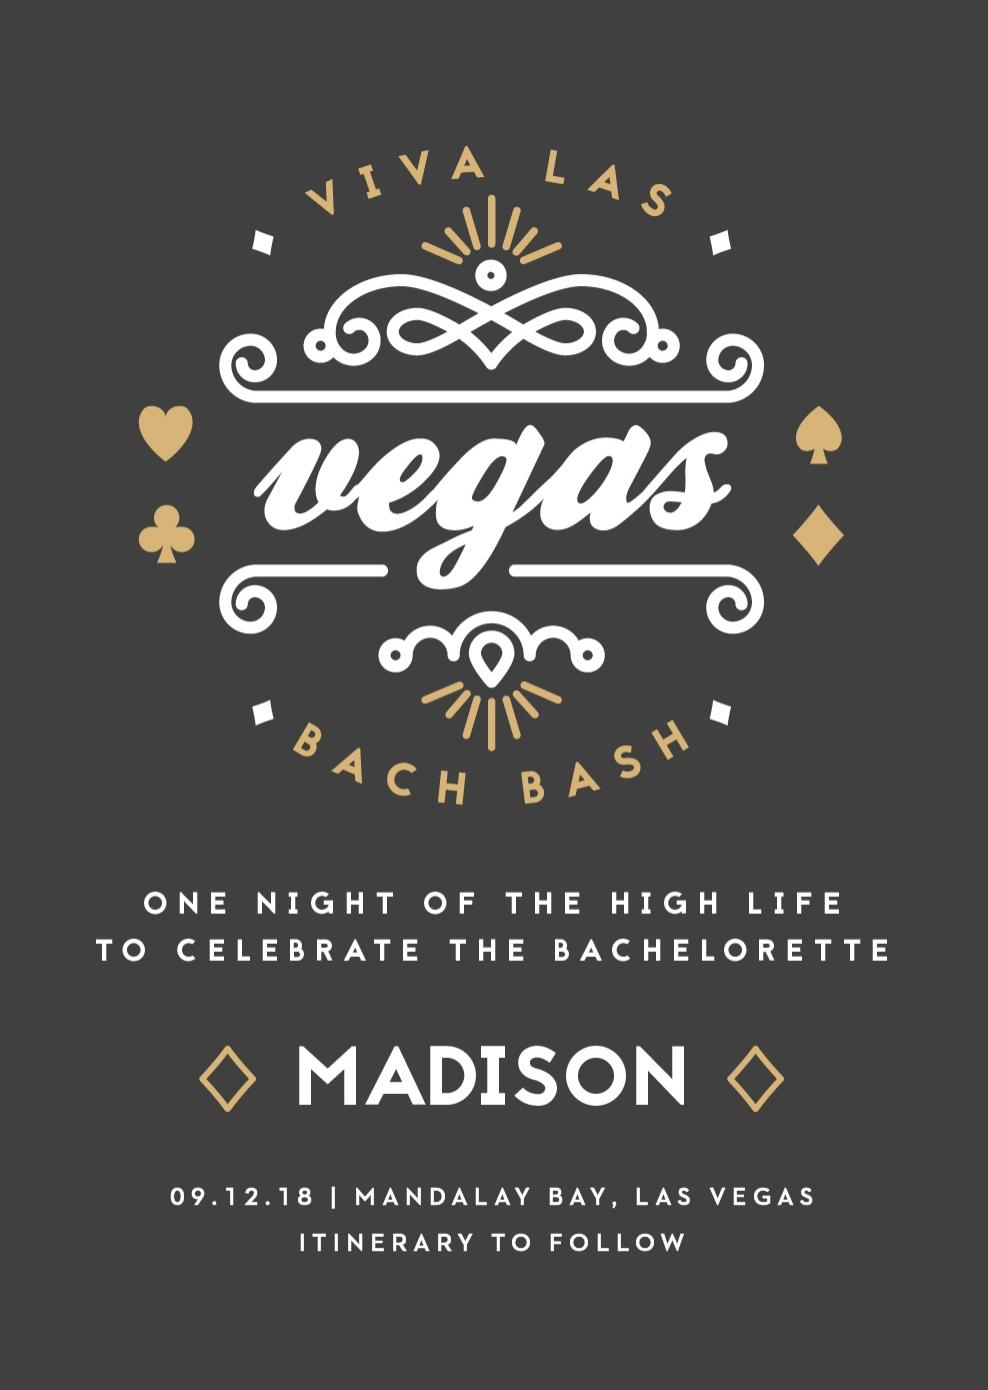 Vegas Bachelorette Party Invitation from Basic Invite